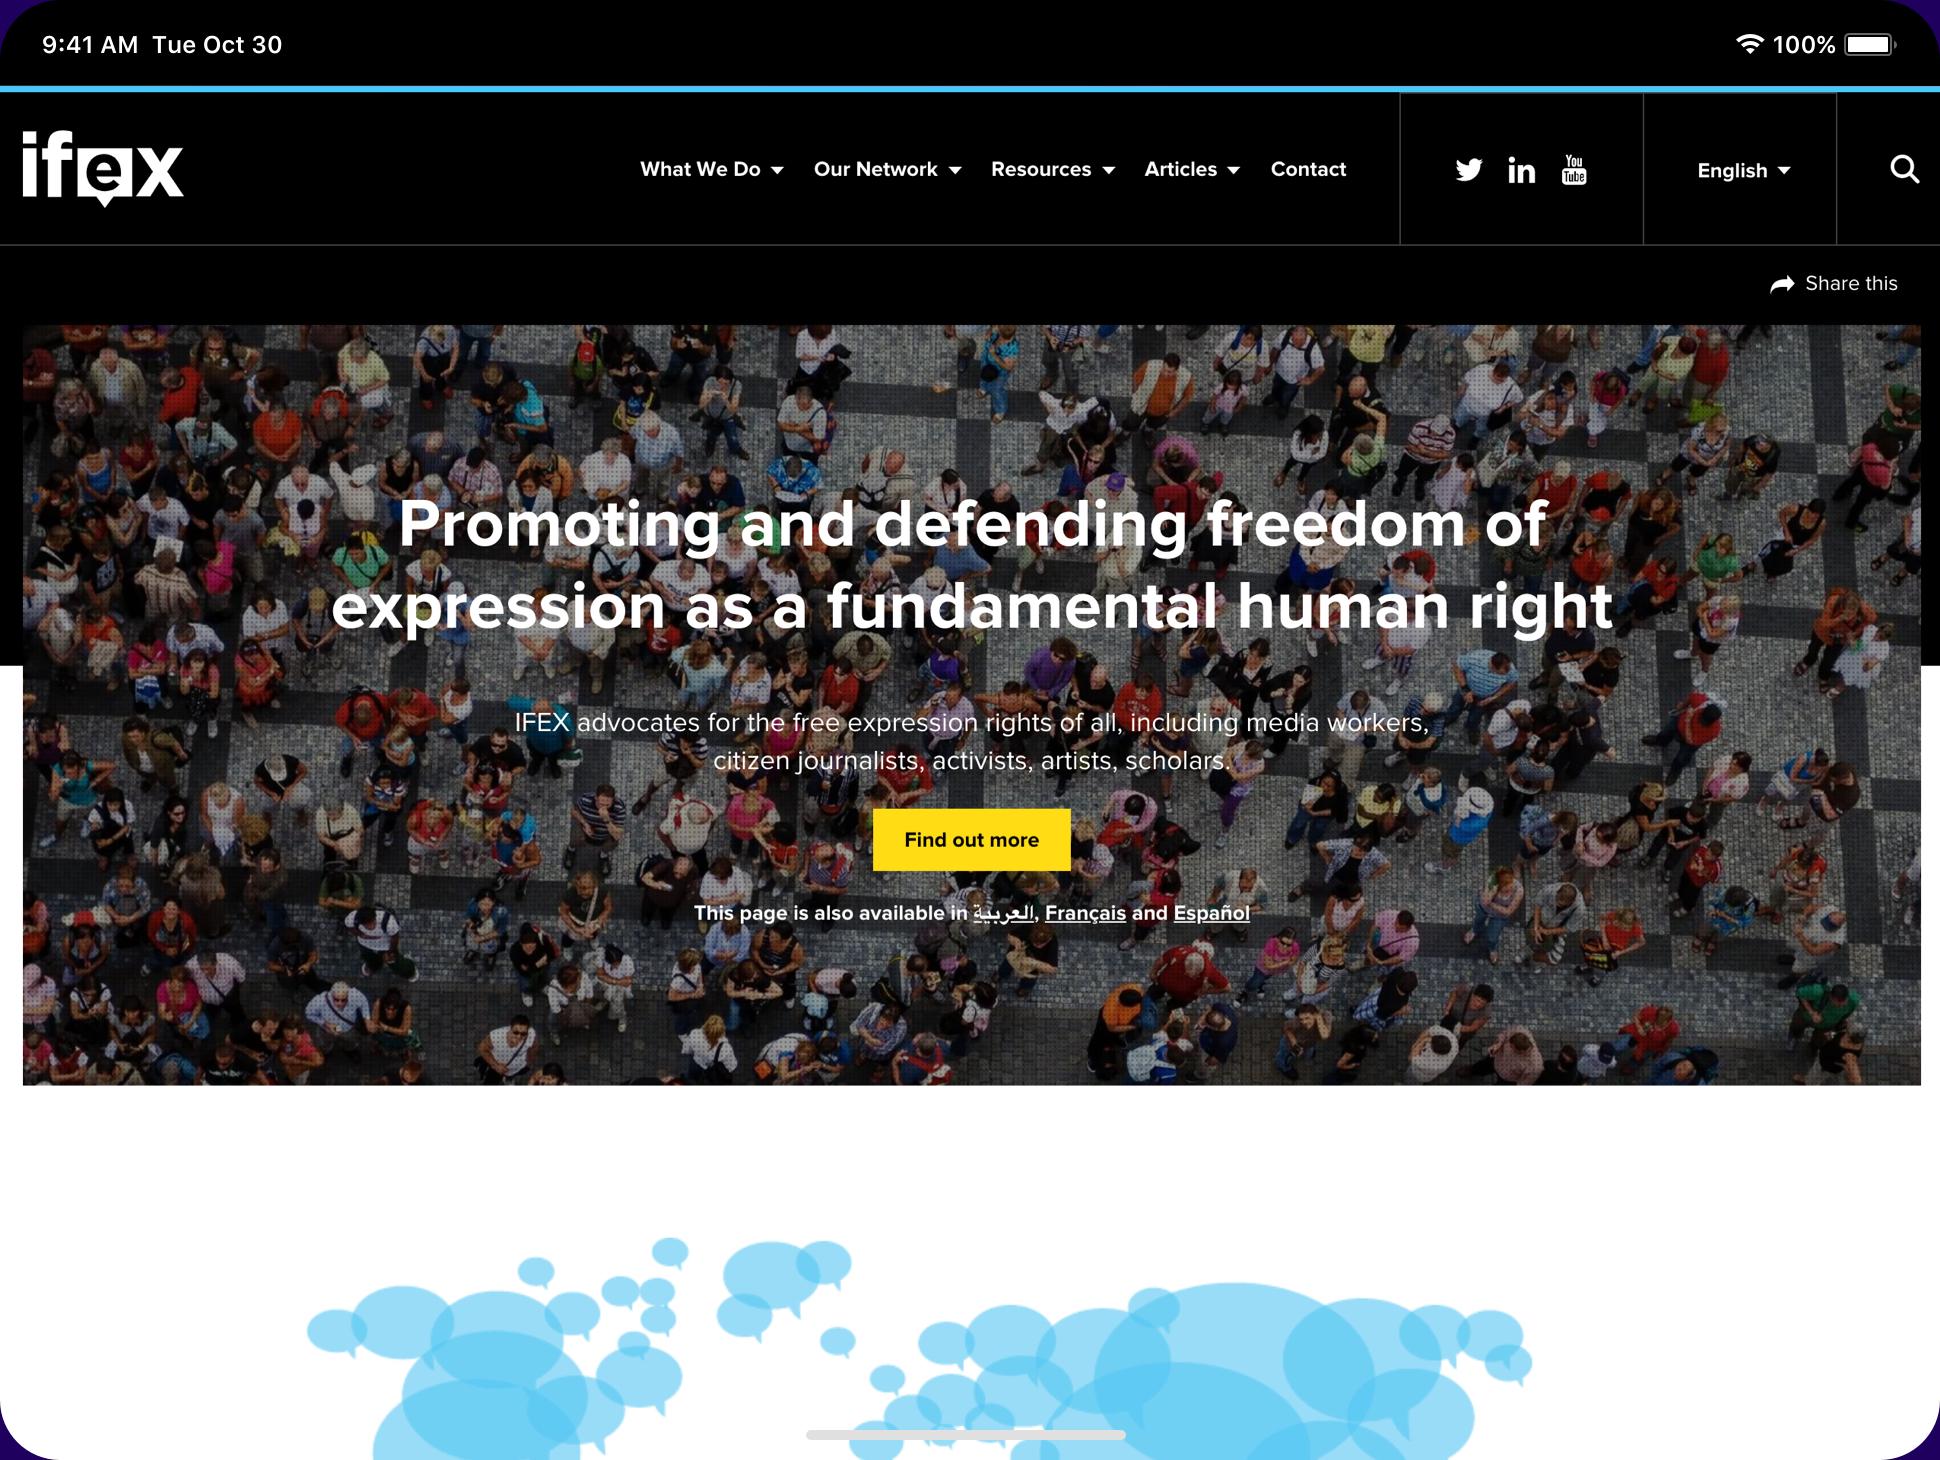 ifex website screenshot